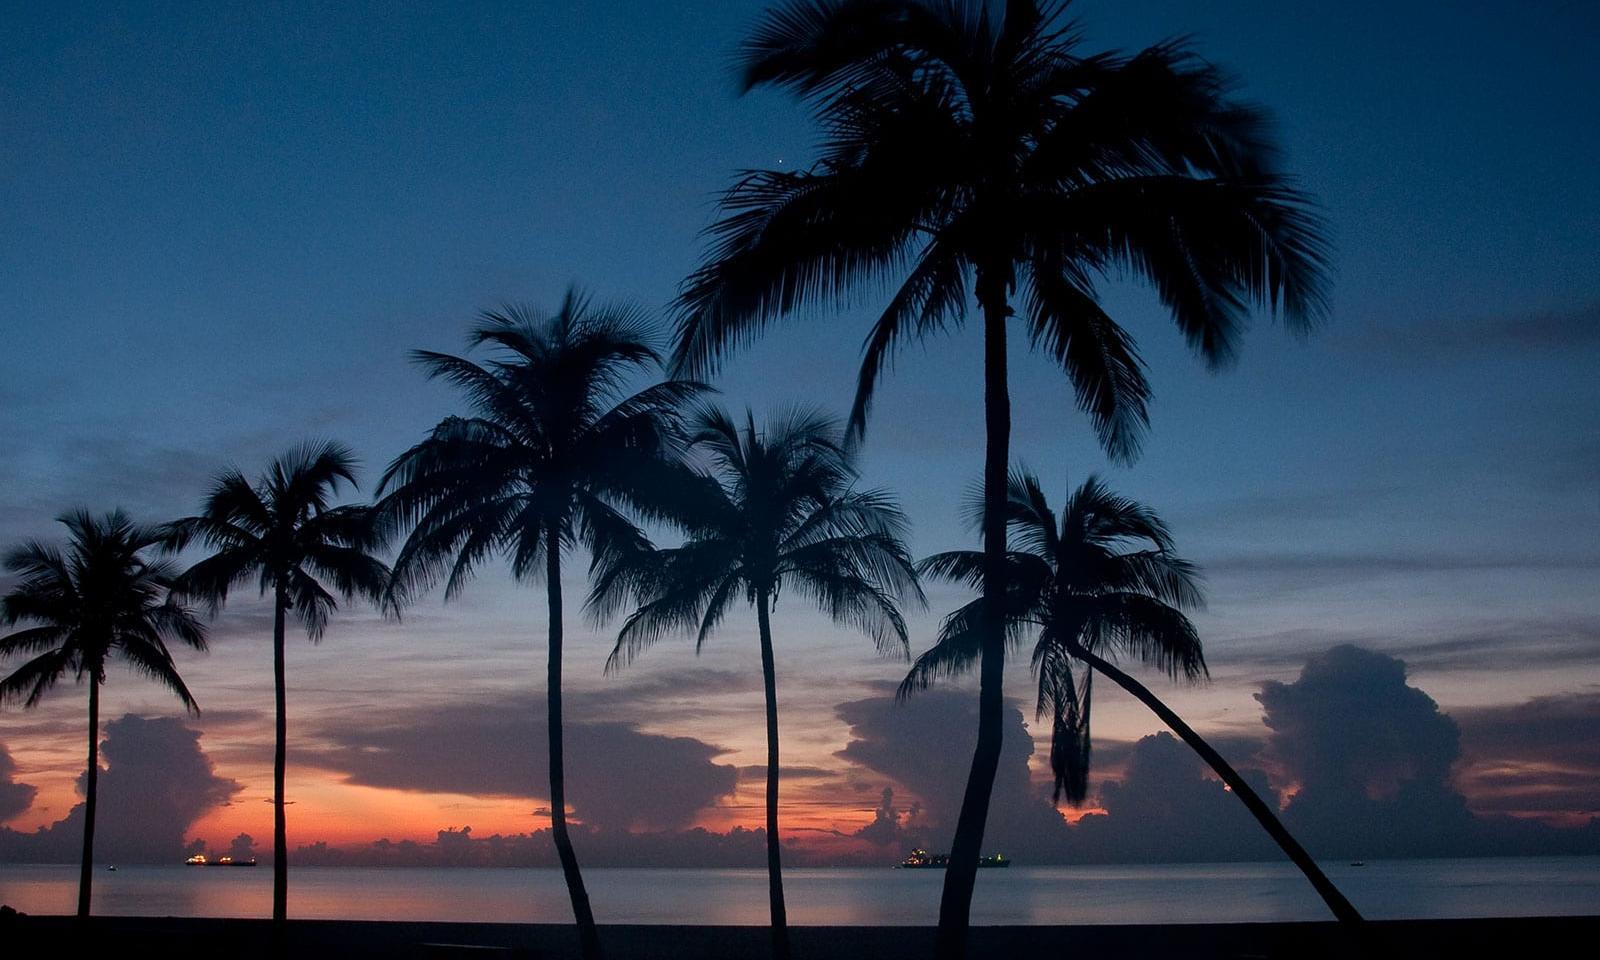 Fort_Lauderdale1